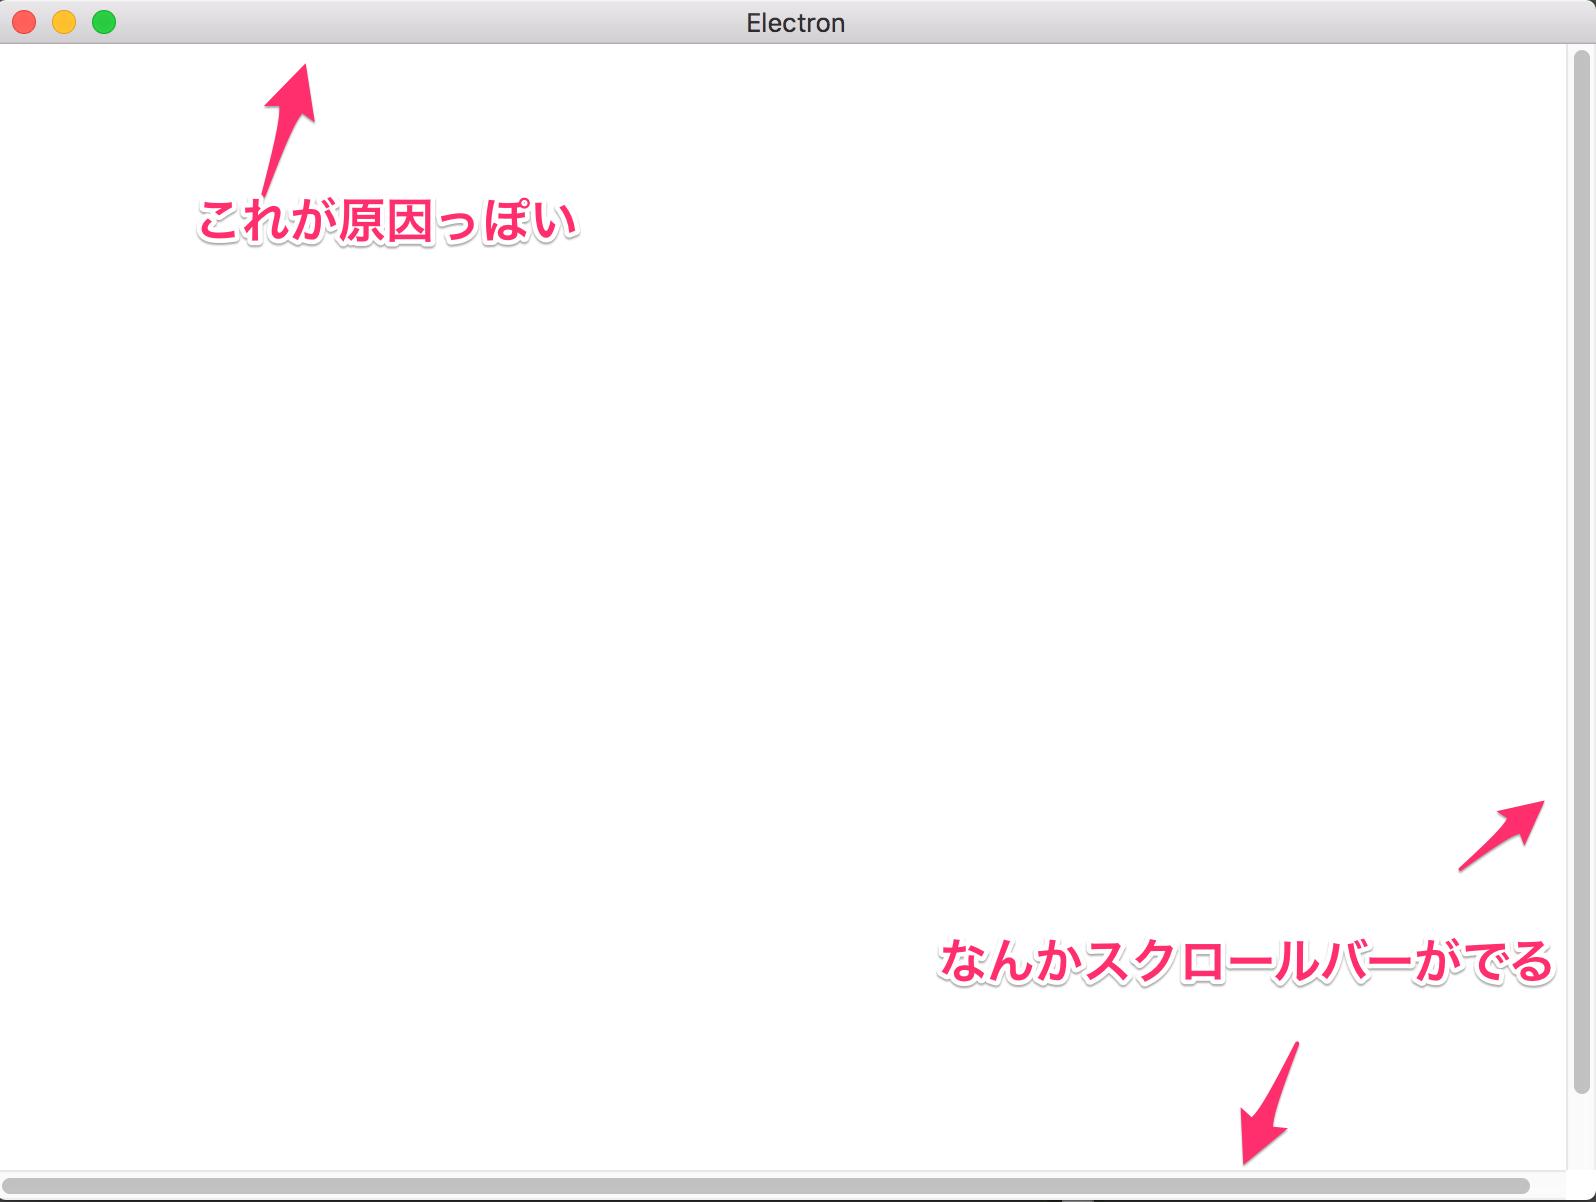 Electron_と_1__node.png